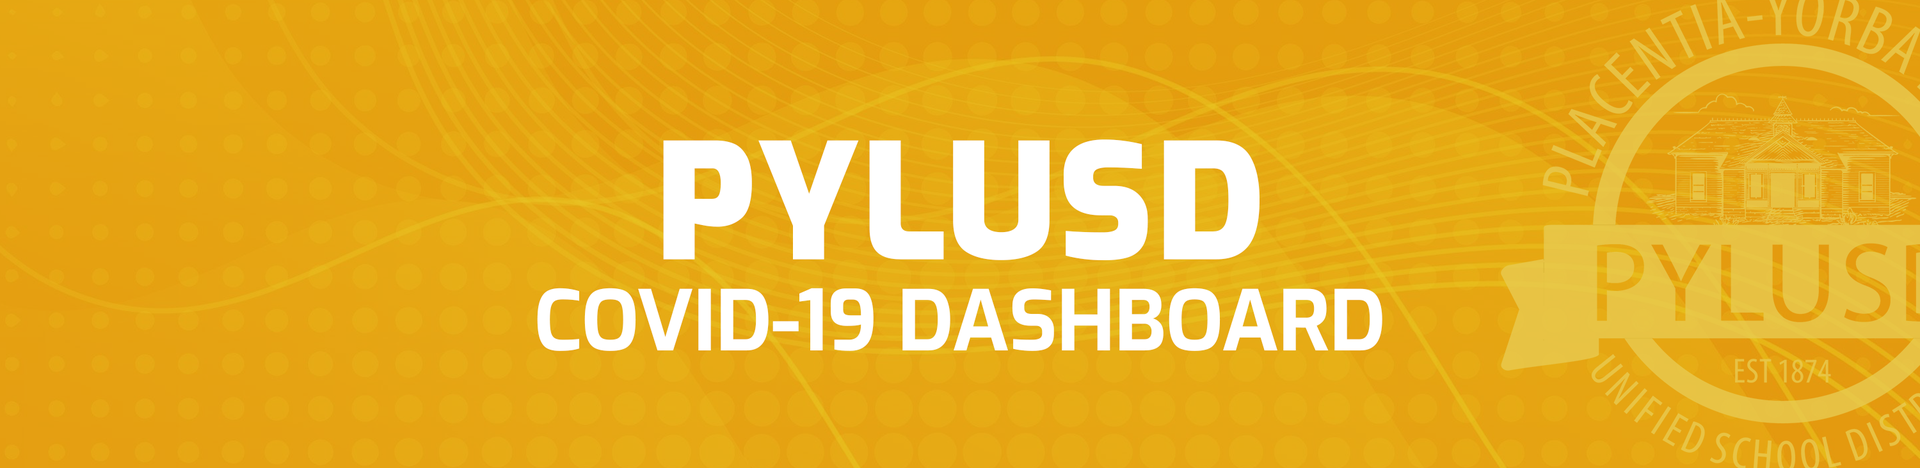 PYLUSD COVID-19 Dashboard.